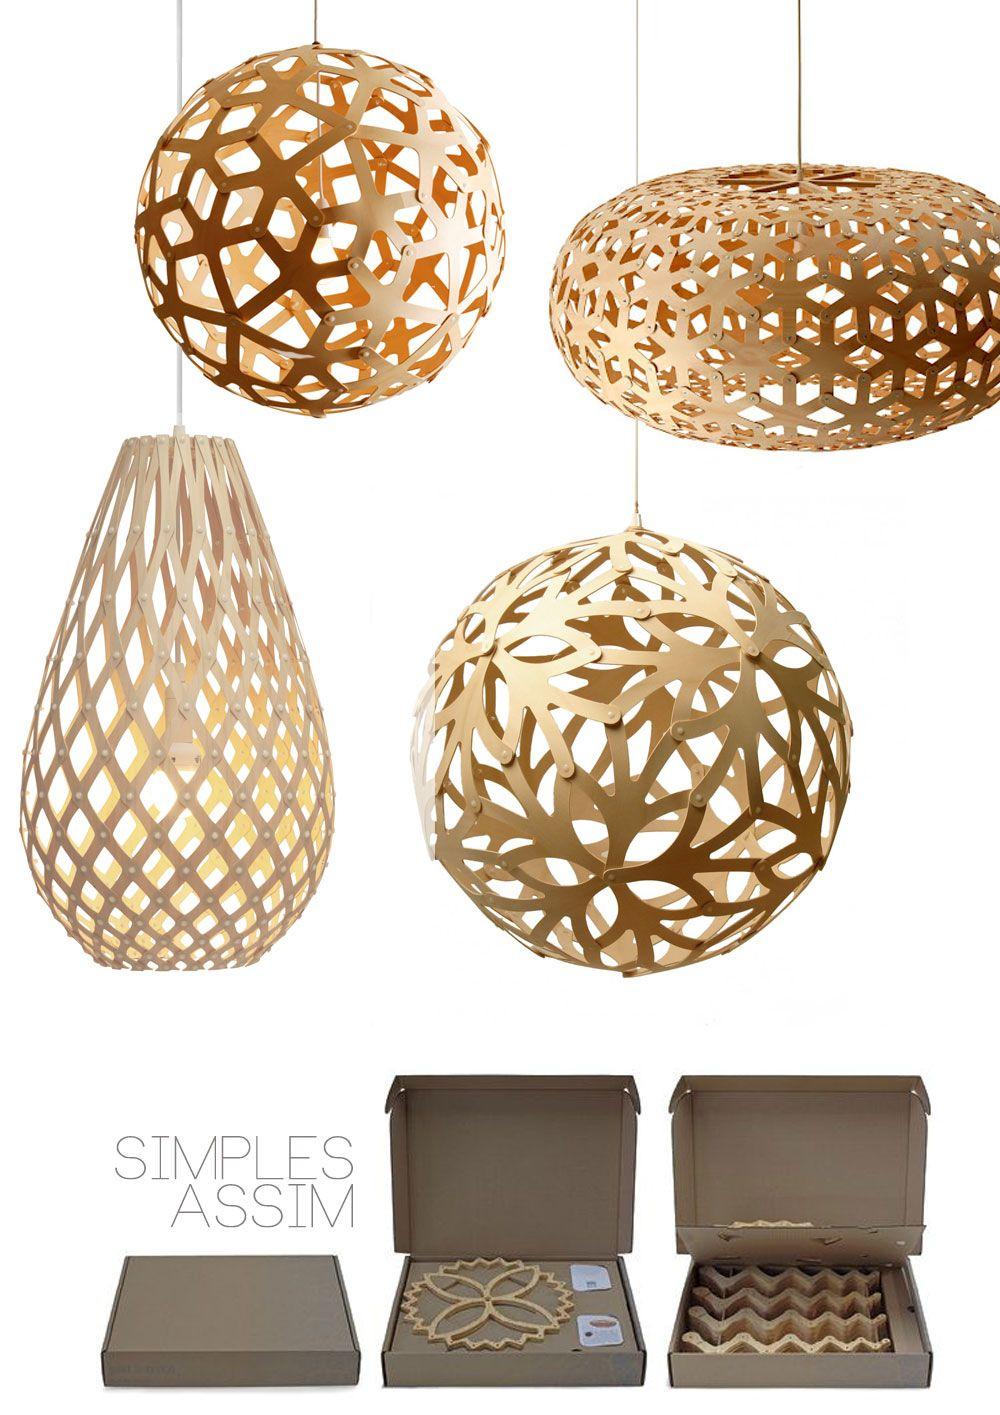 home lighting design pinterest beleuchtung lampen und leuchten. Black Bedroom Furniture Sets. Home Design Ideas